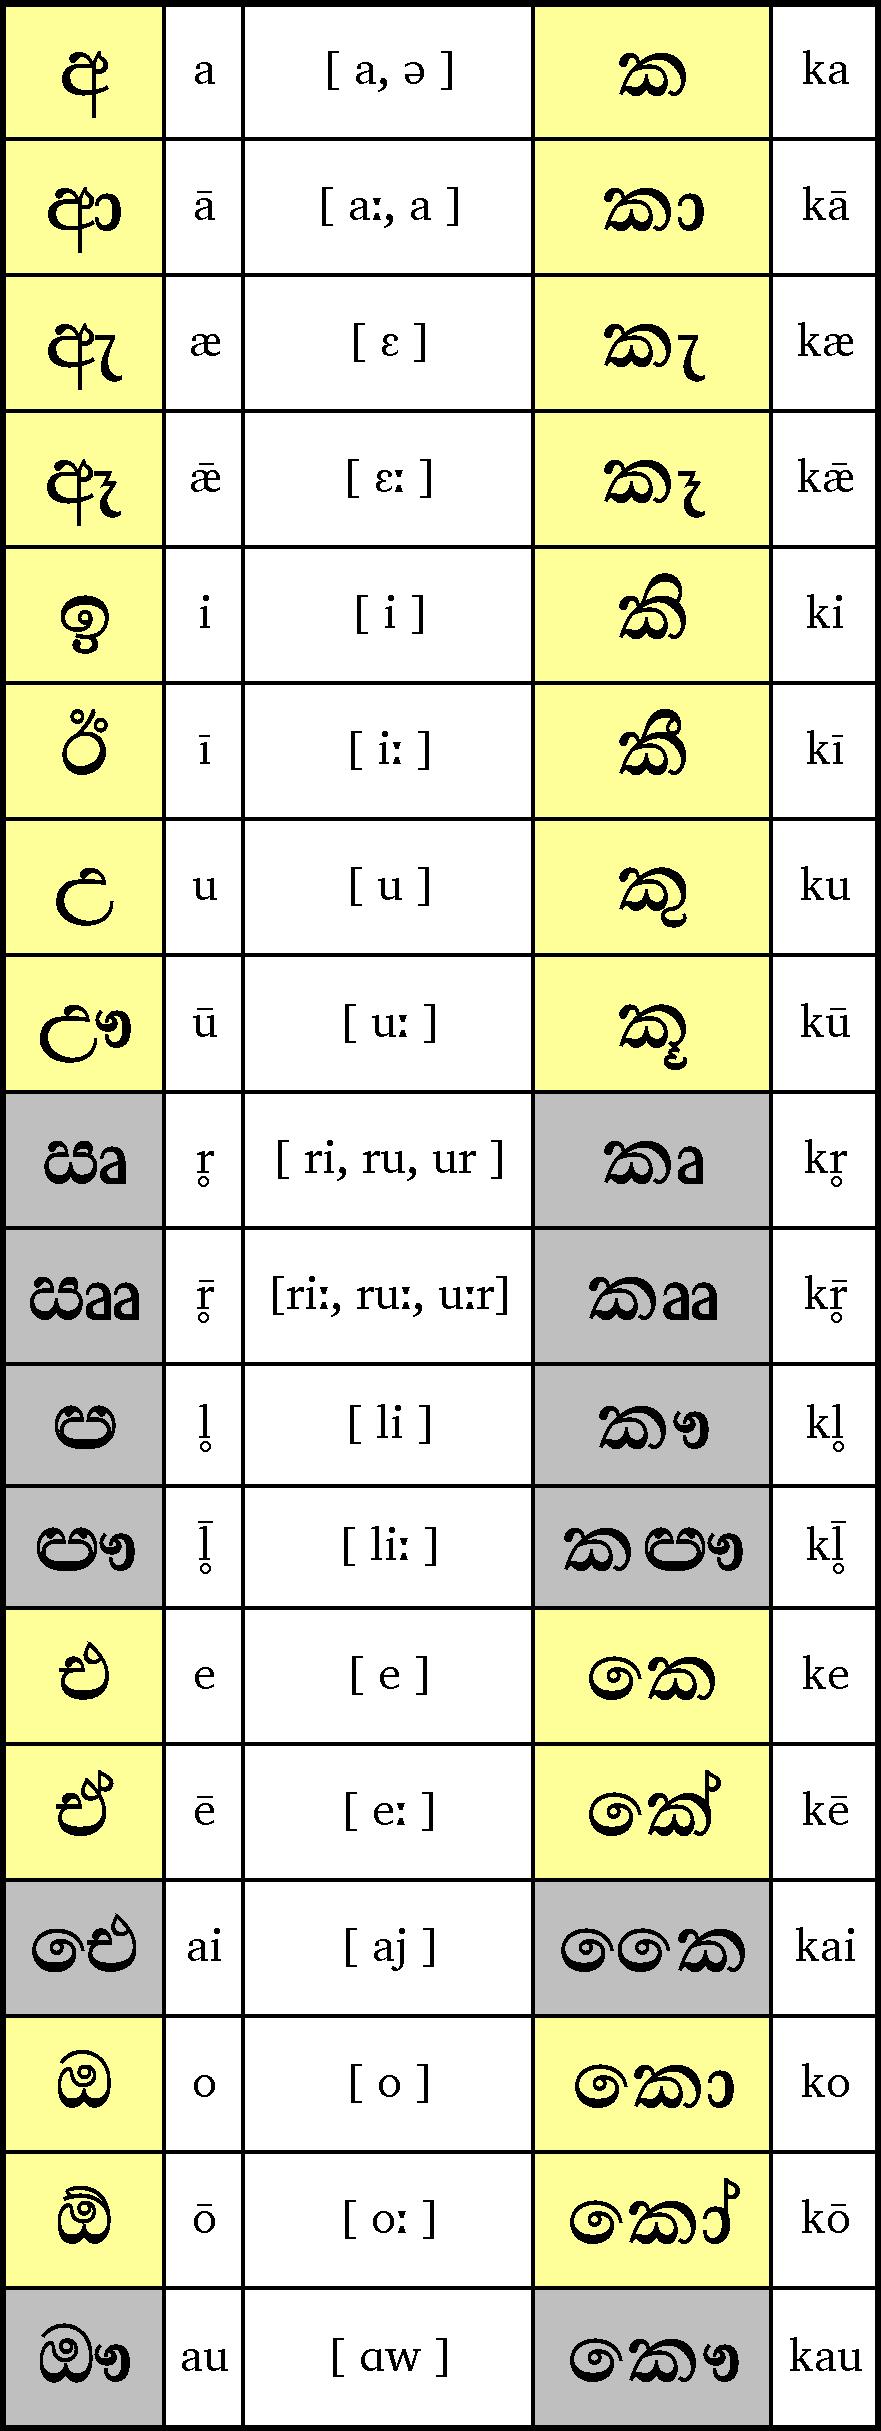 File:Sinhala-vowel.png - Wikimedia Commons